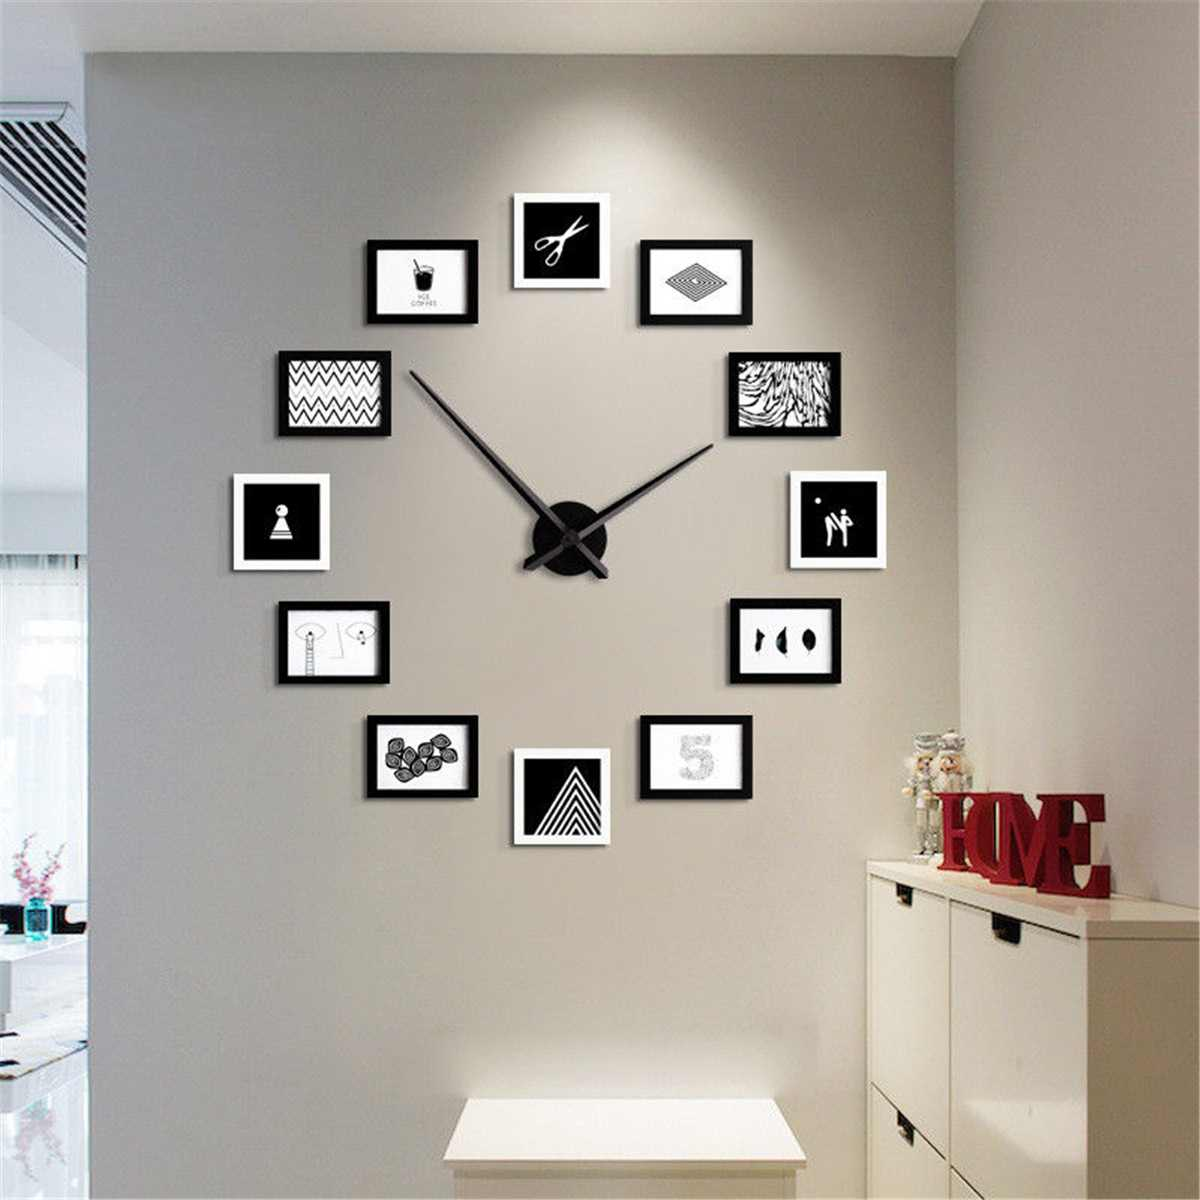 2019 12 Photo Frames DIY Wall Clock Modern Design Wood Photo Frame ...